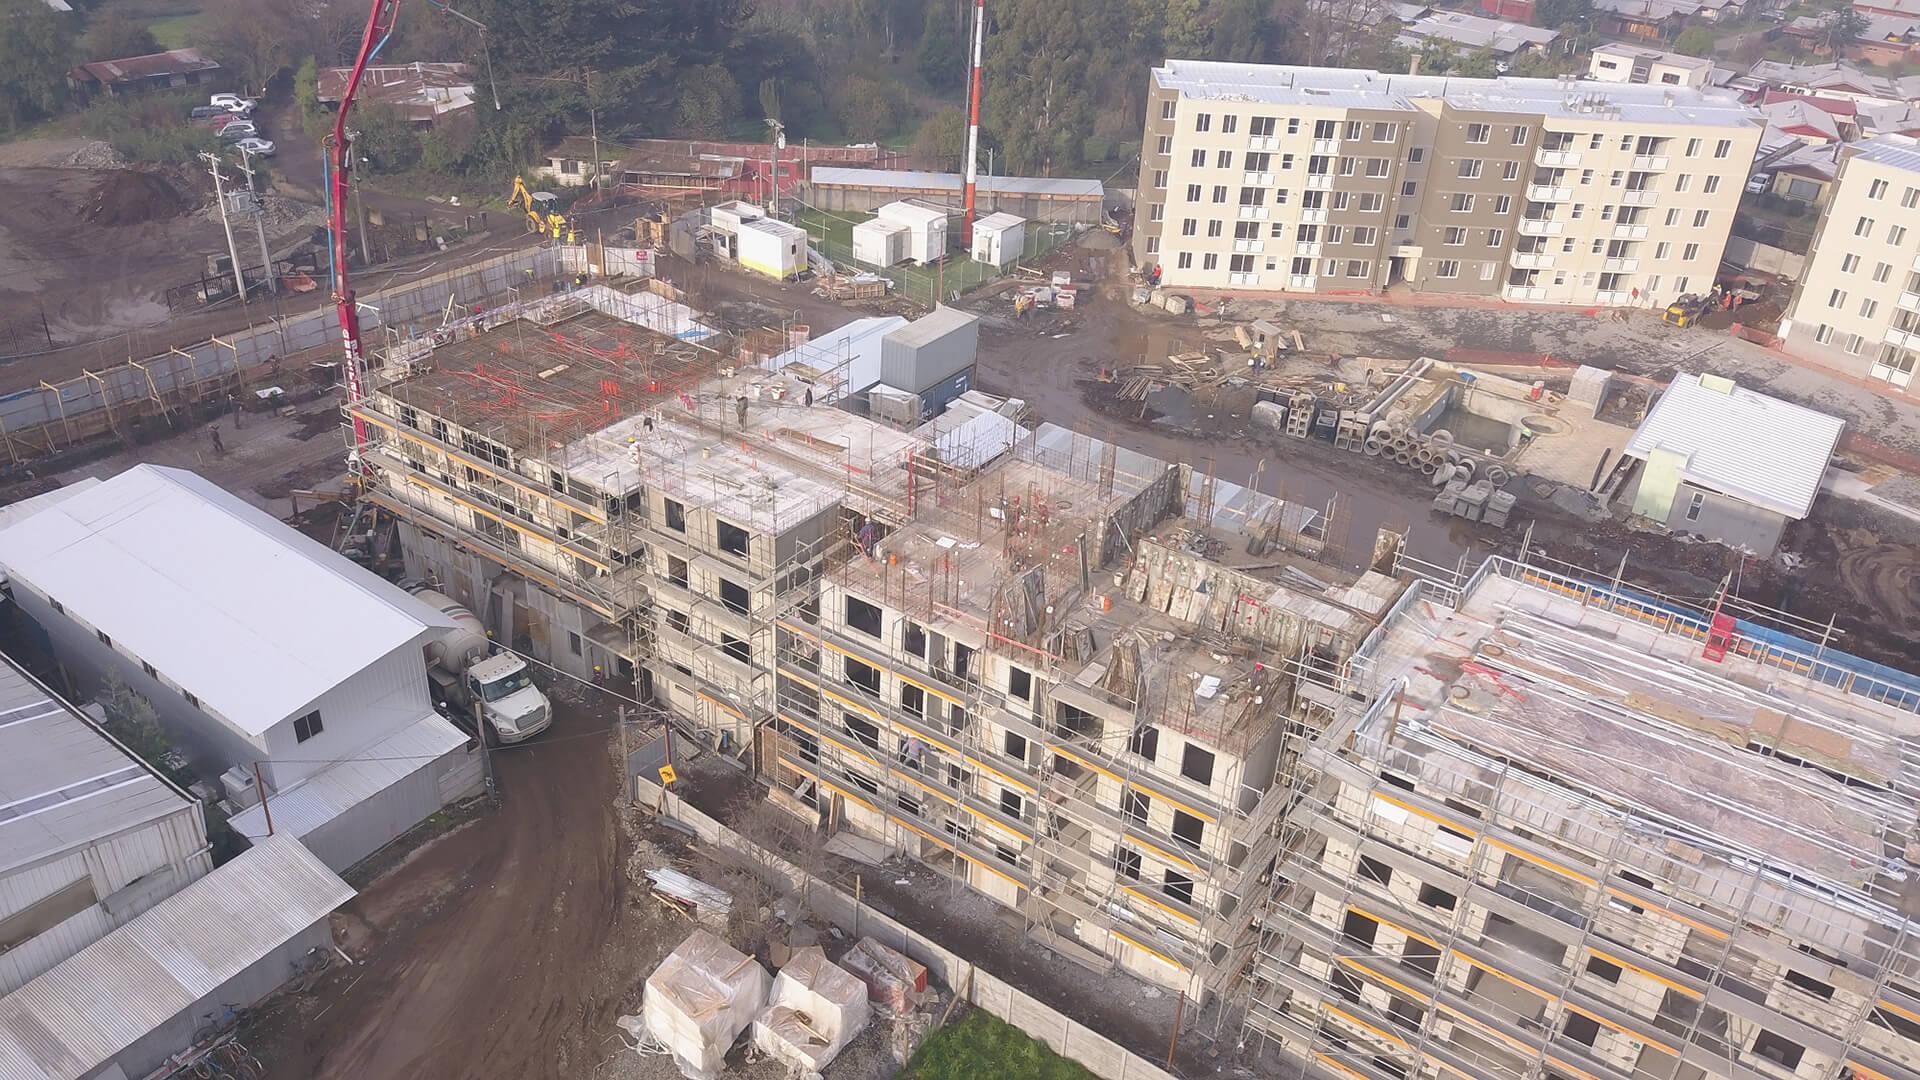 Condominio-Parque-Oriente-avance-obra-01